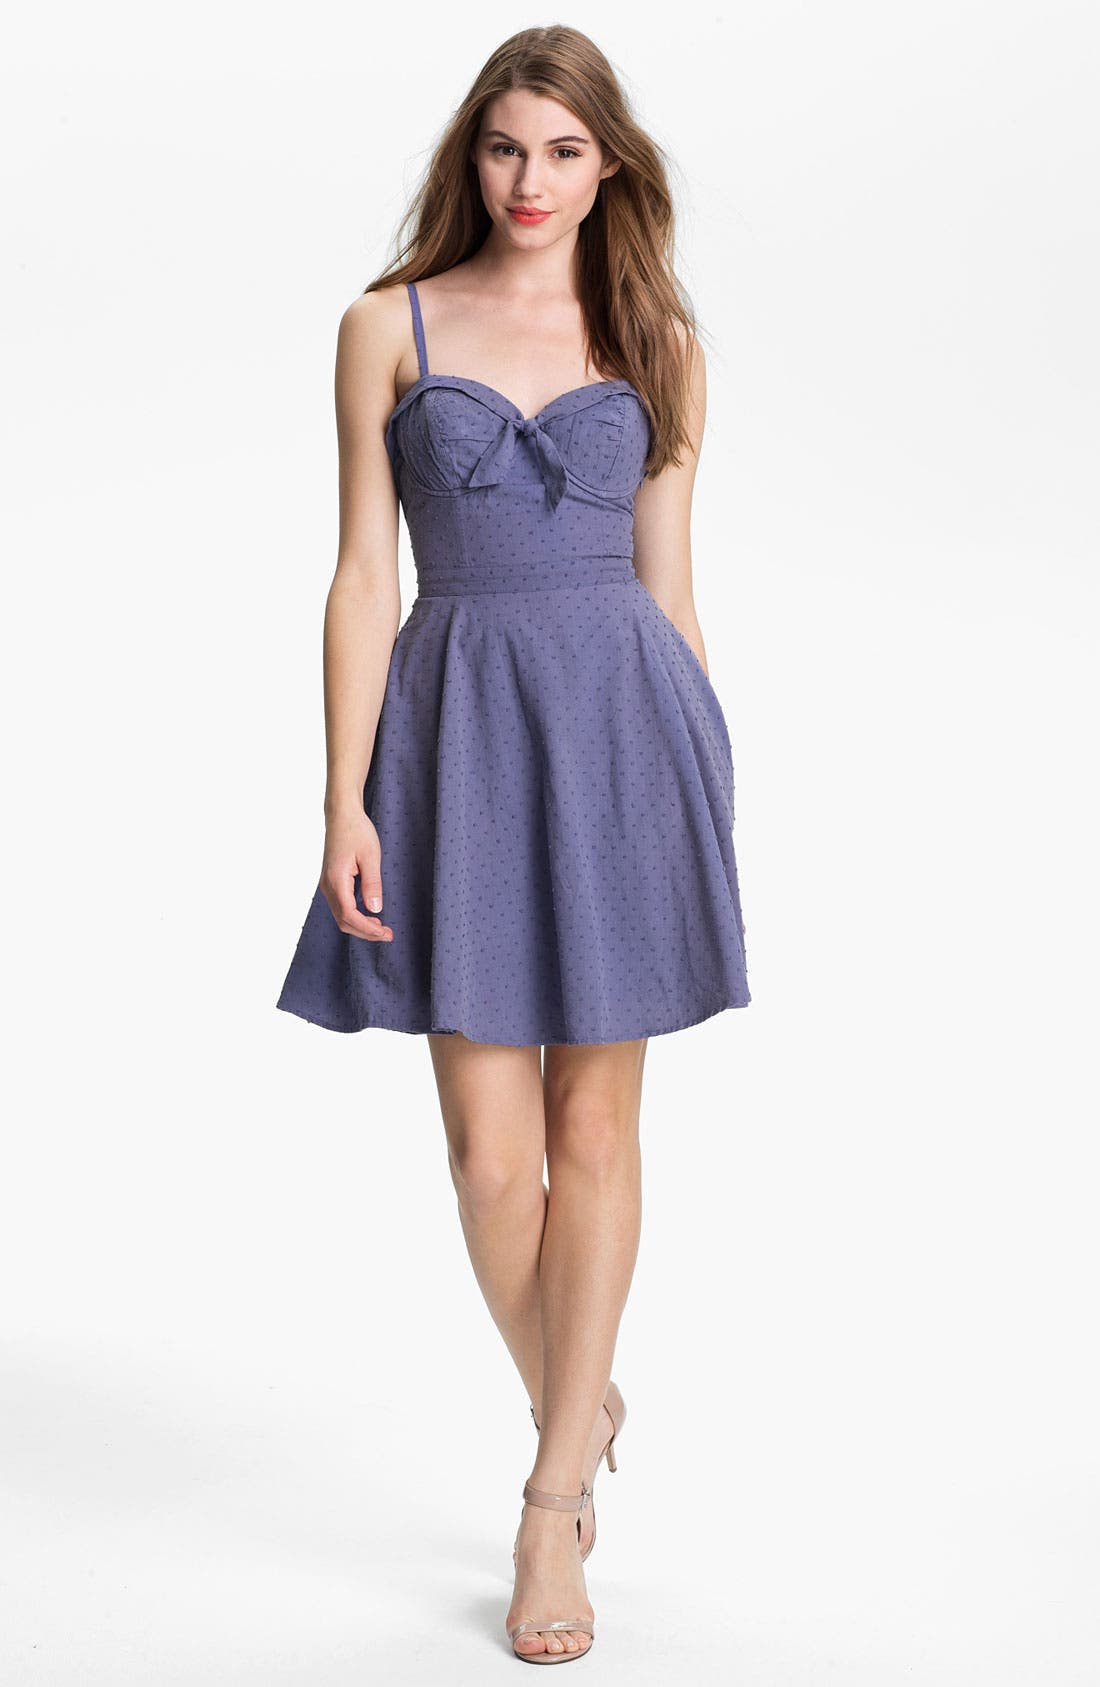 Main Image - Jessica Simpson 'Ava' Swiss Dot Dress (Online Exclusive)